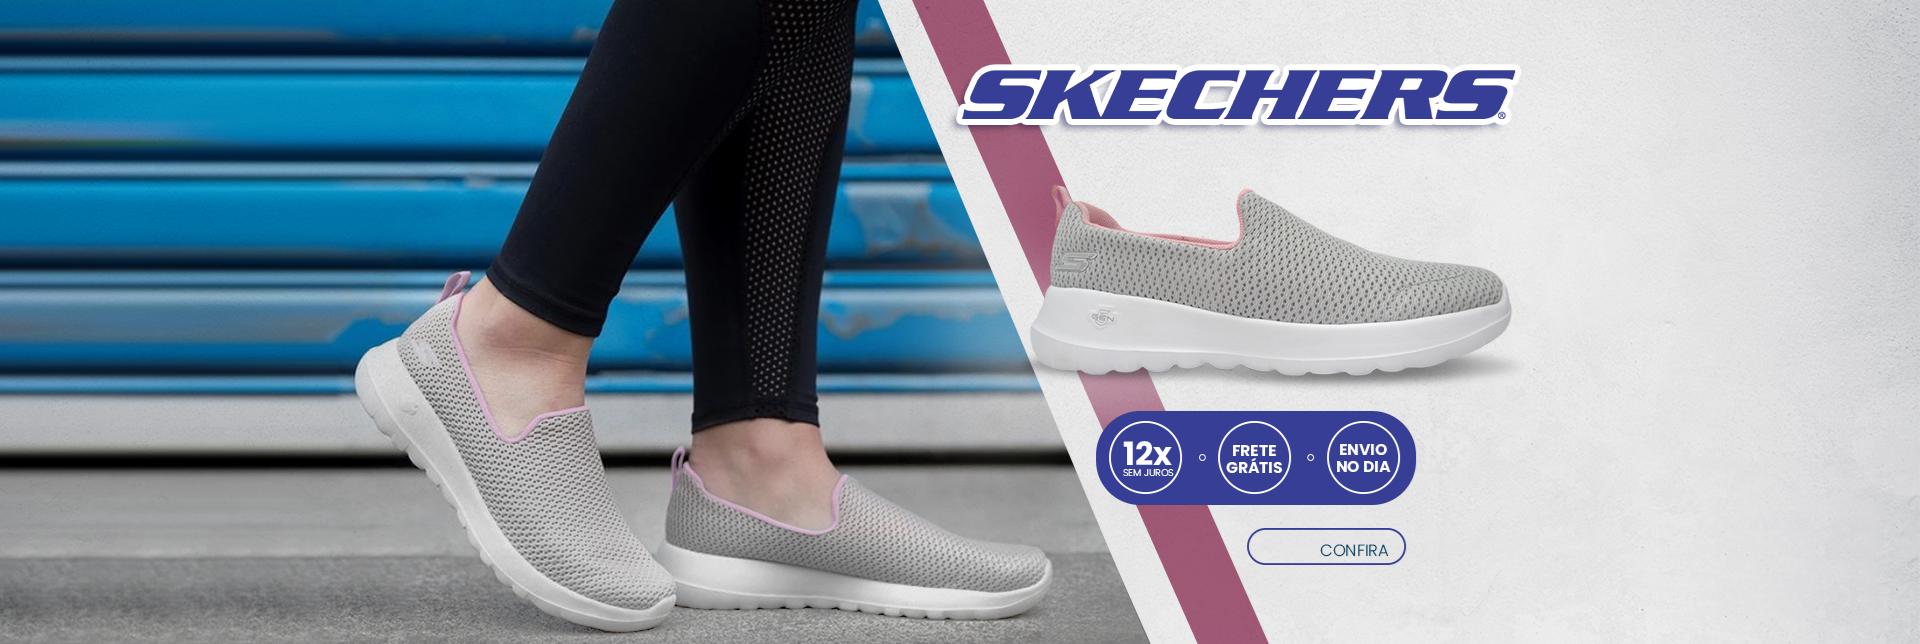 Calçados Skechers 2021